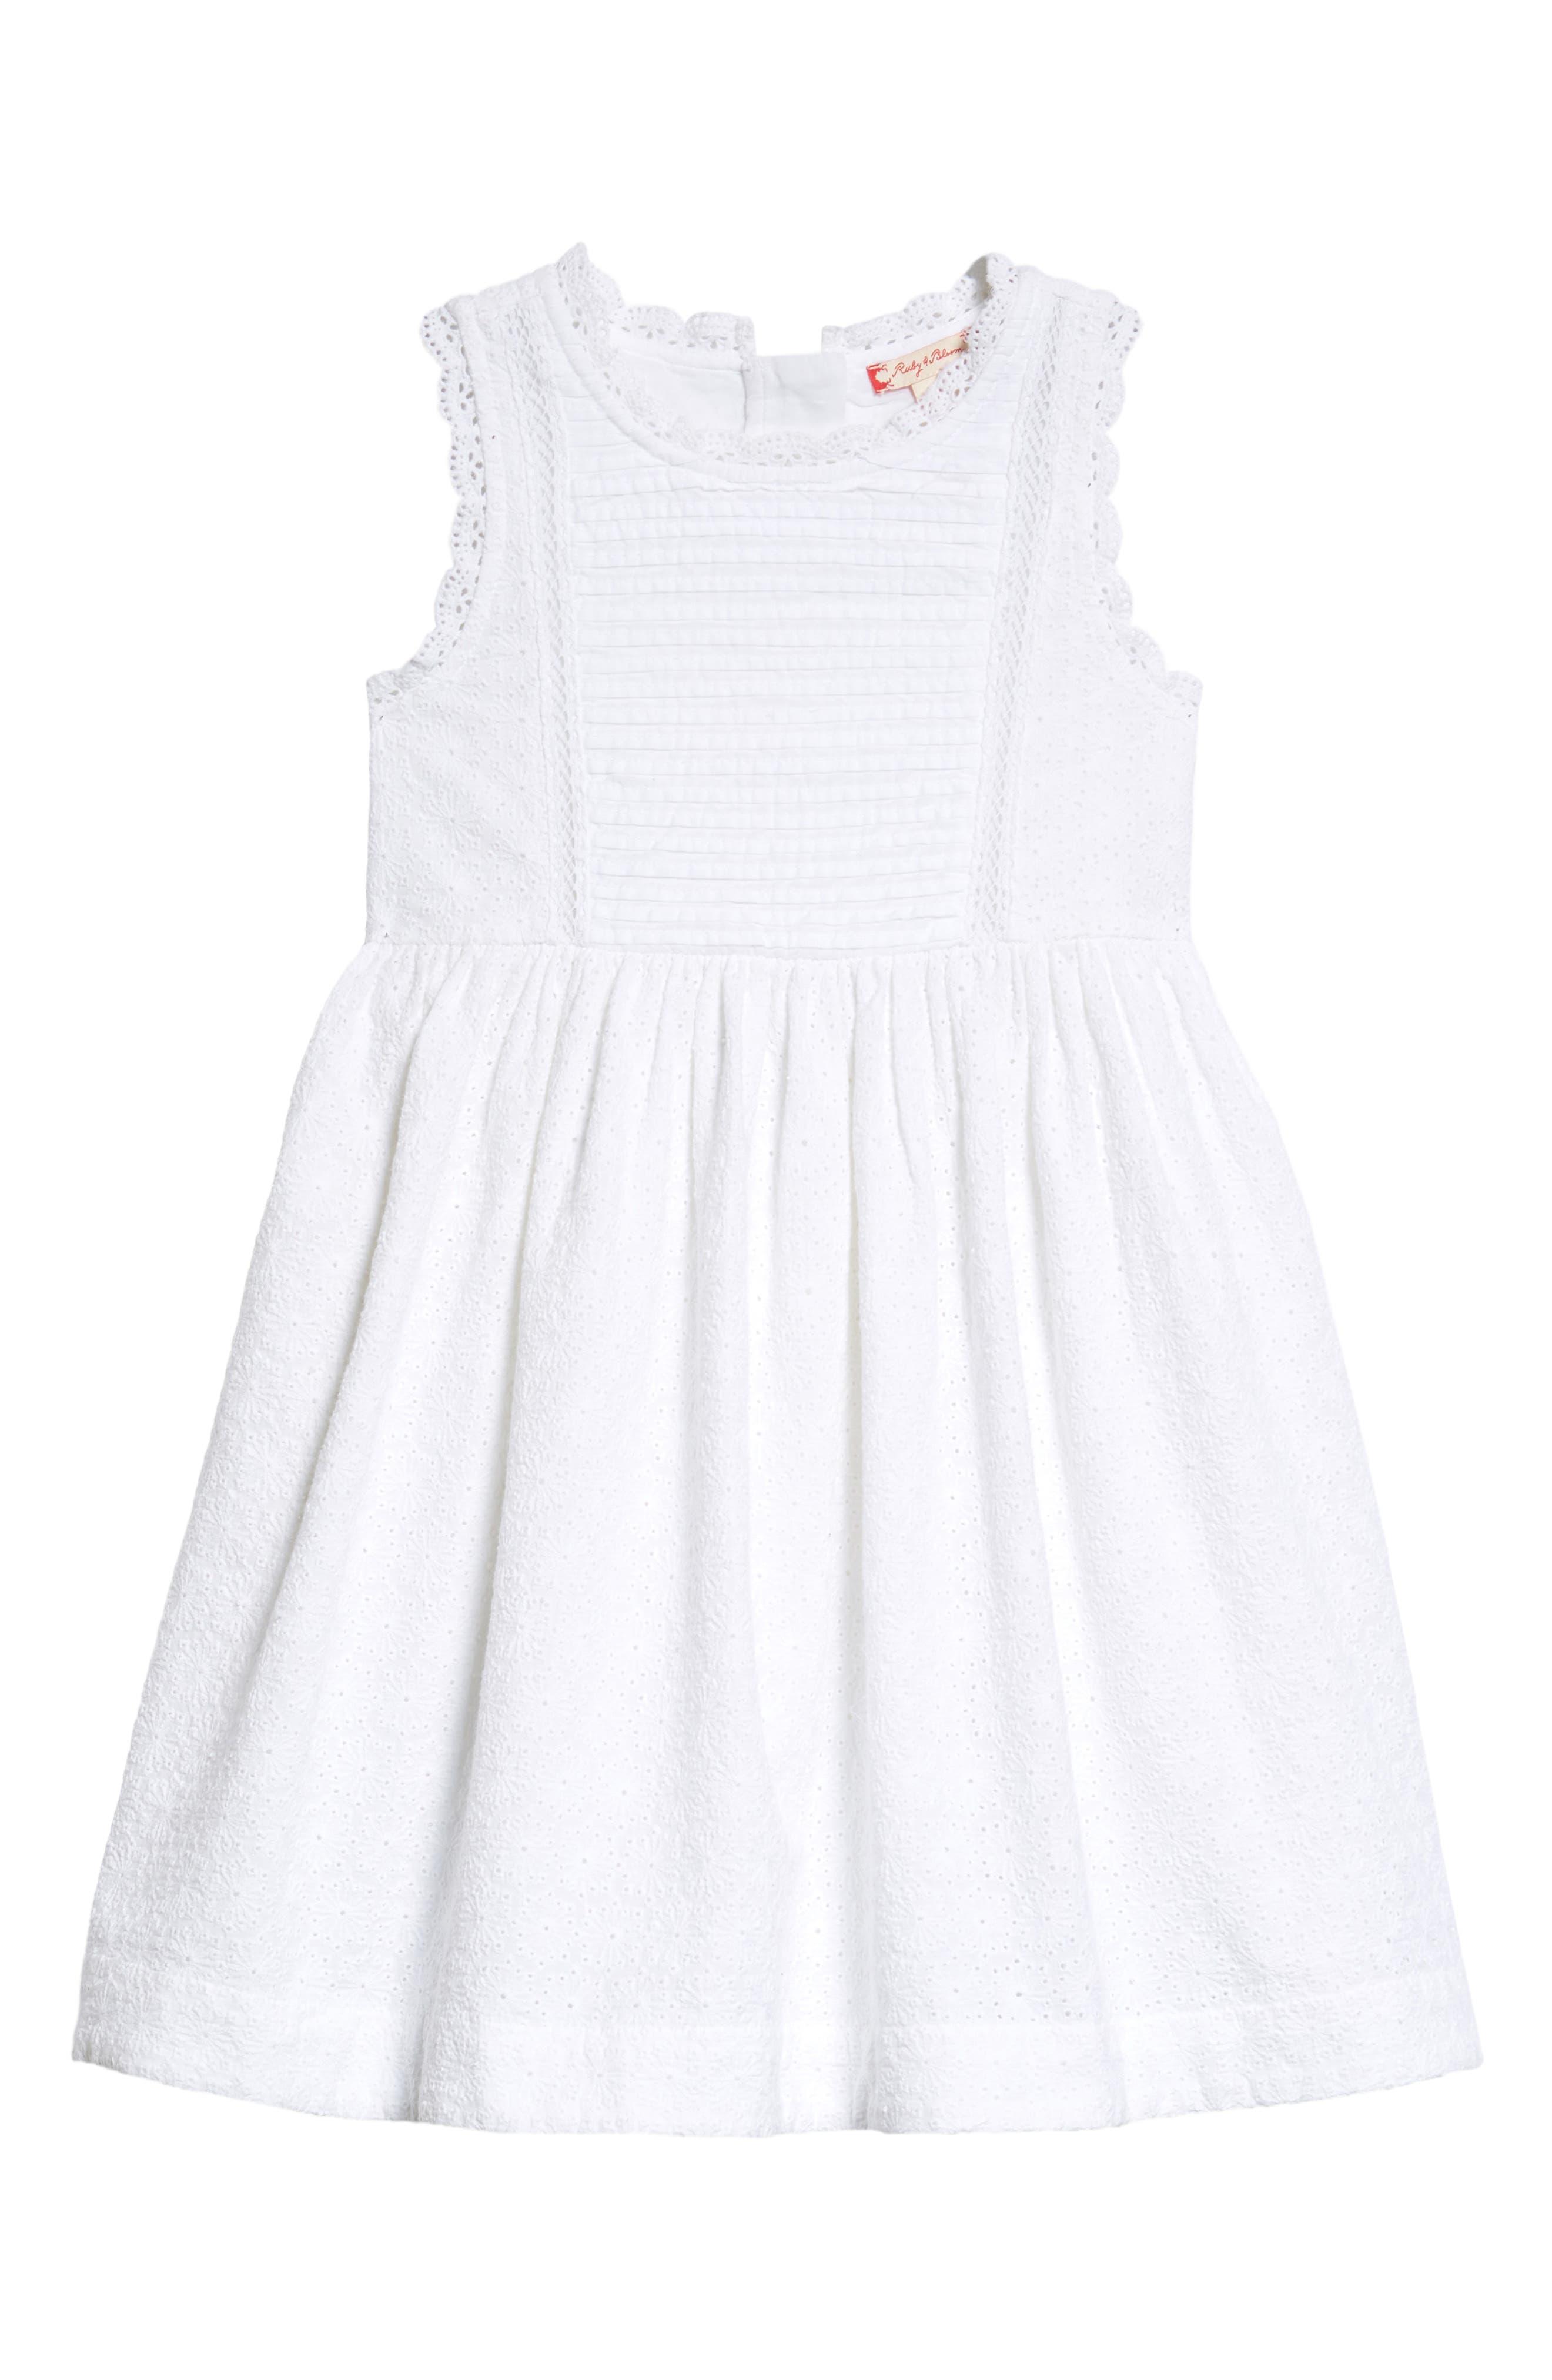 Lace Shift Dress,                         Main,                         color, White